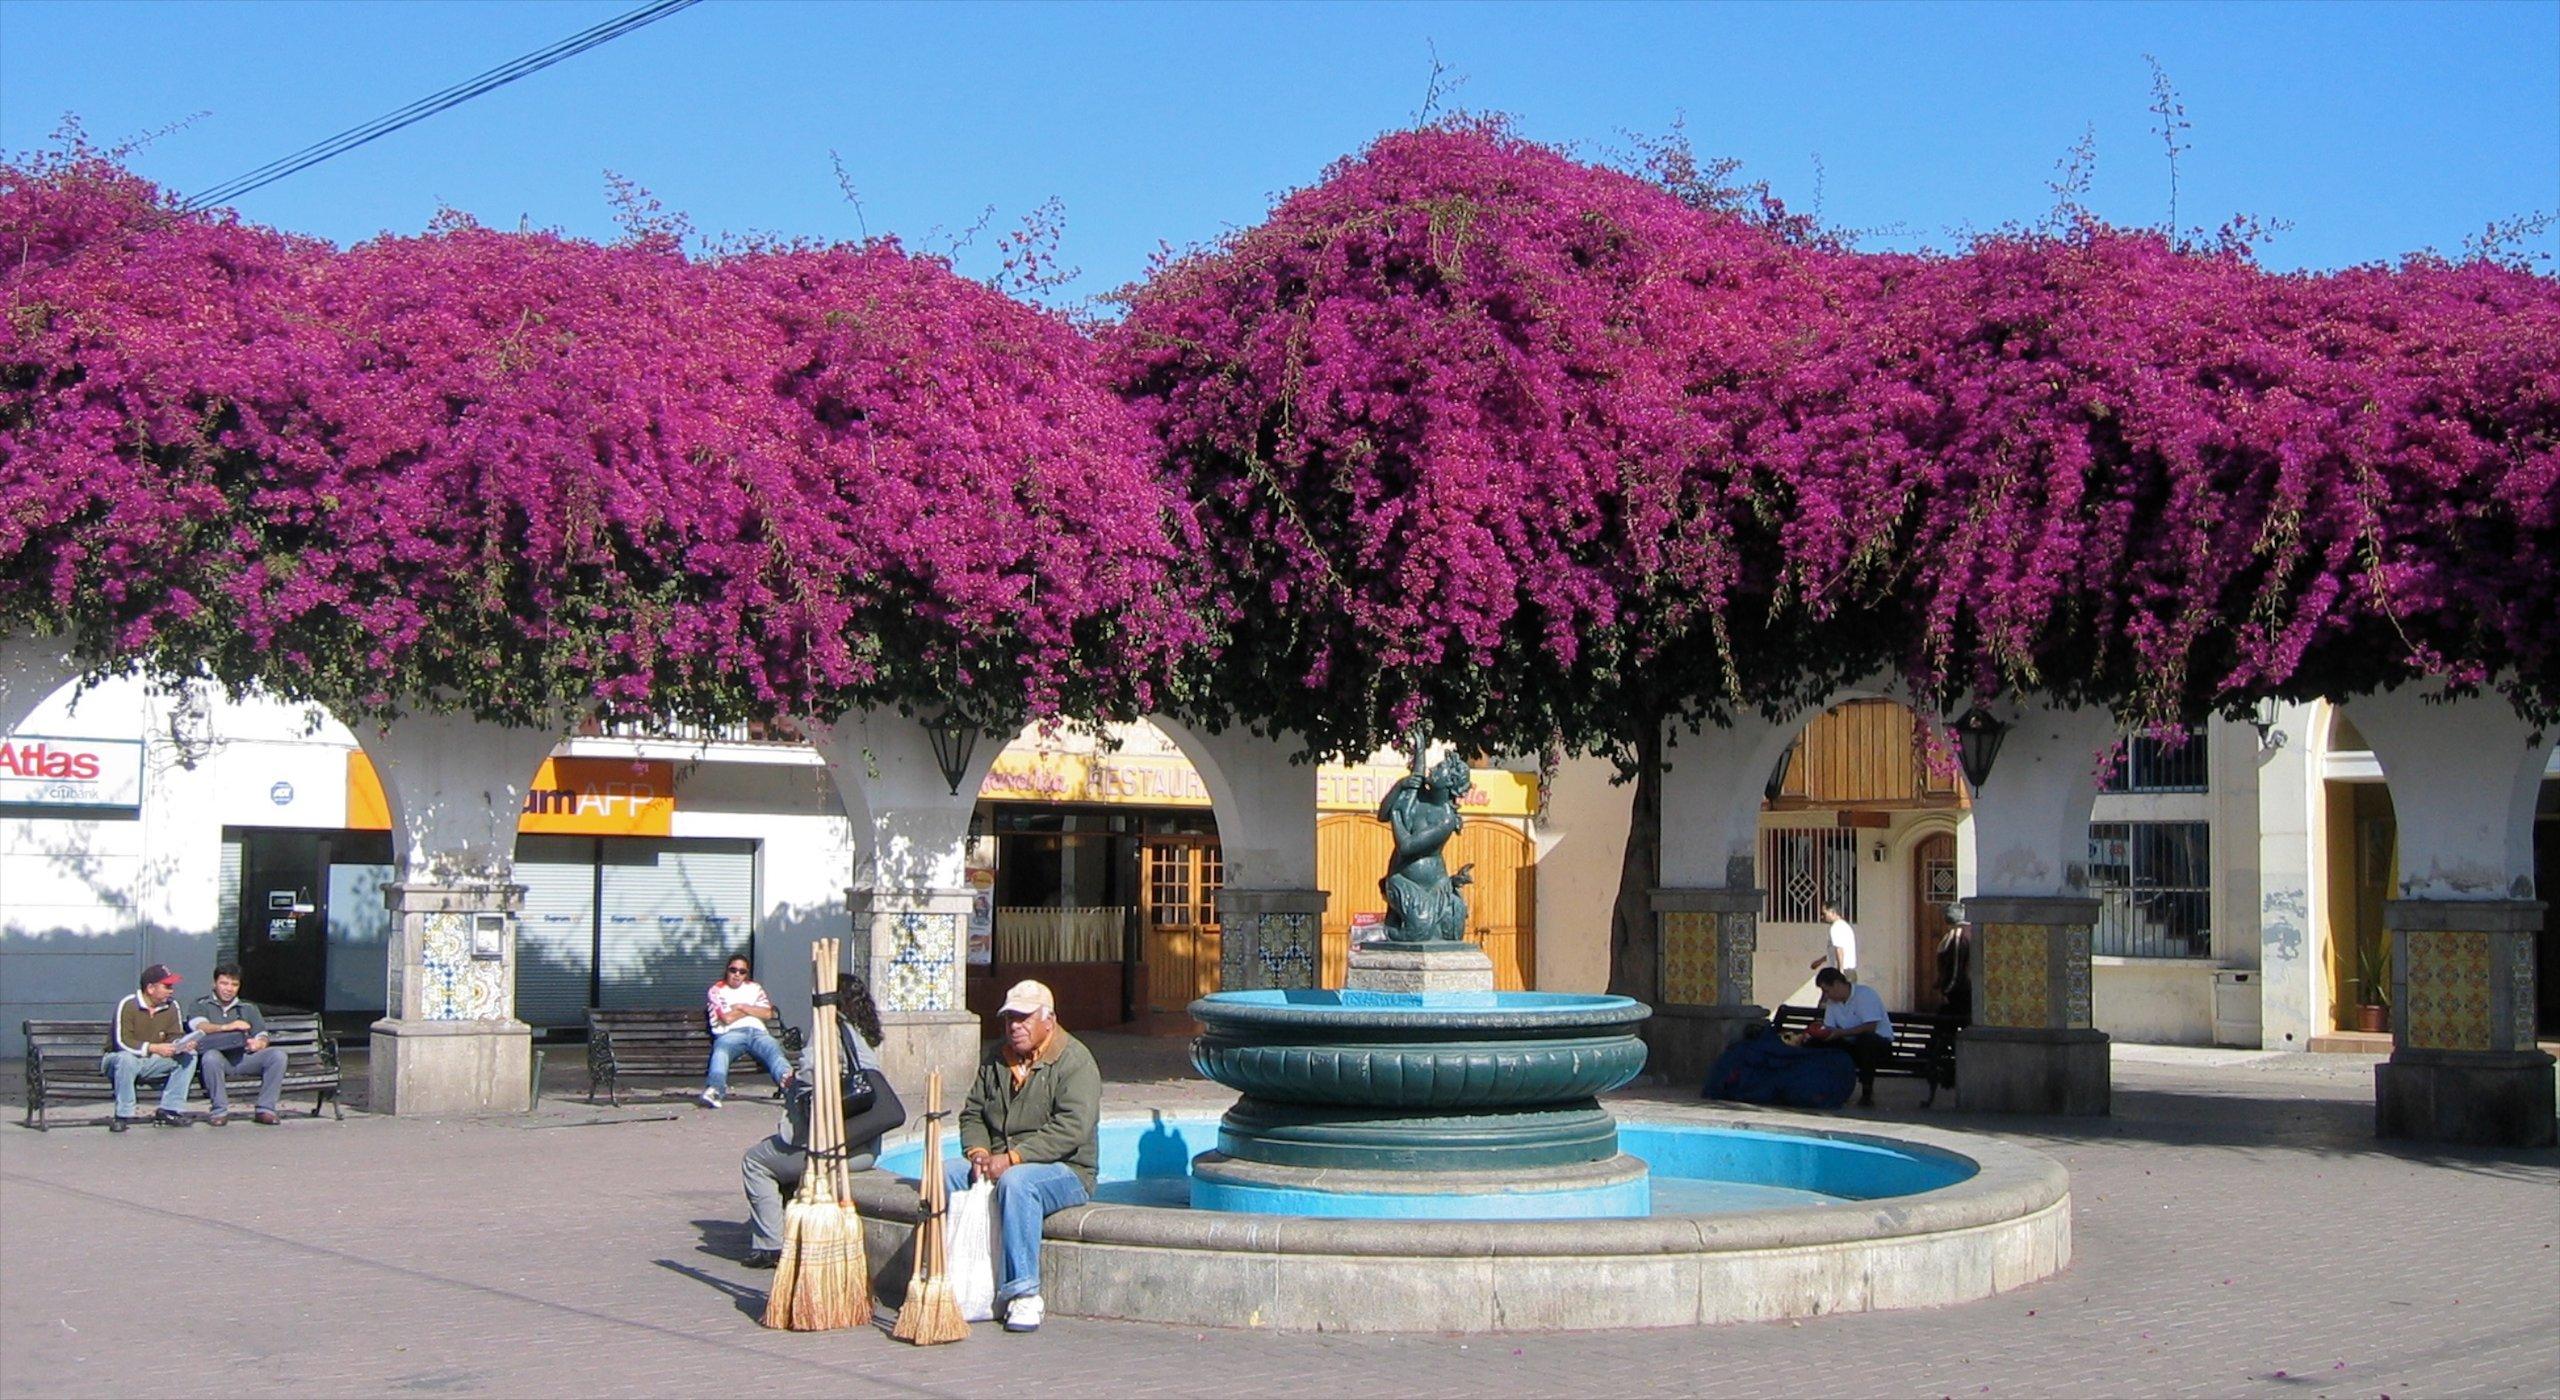 Elqui Province, Coquimbo Region, Chile